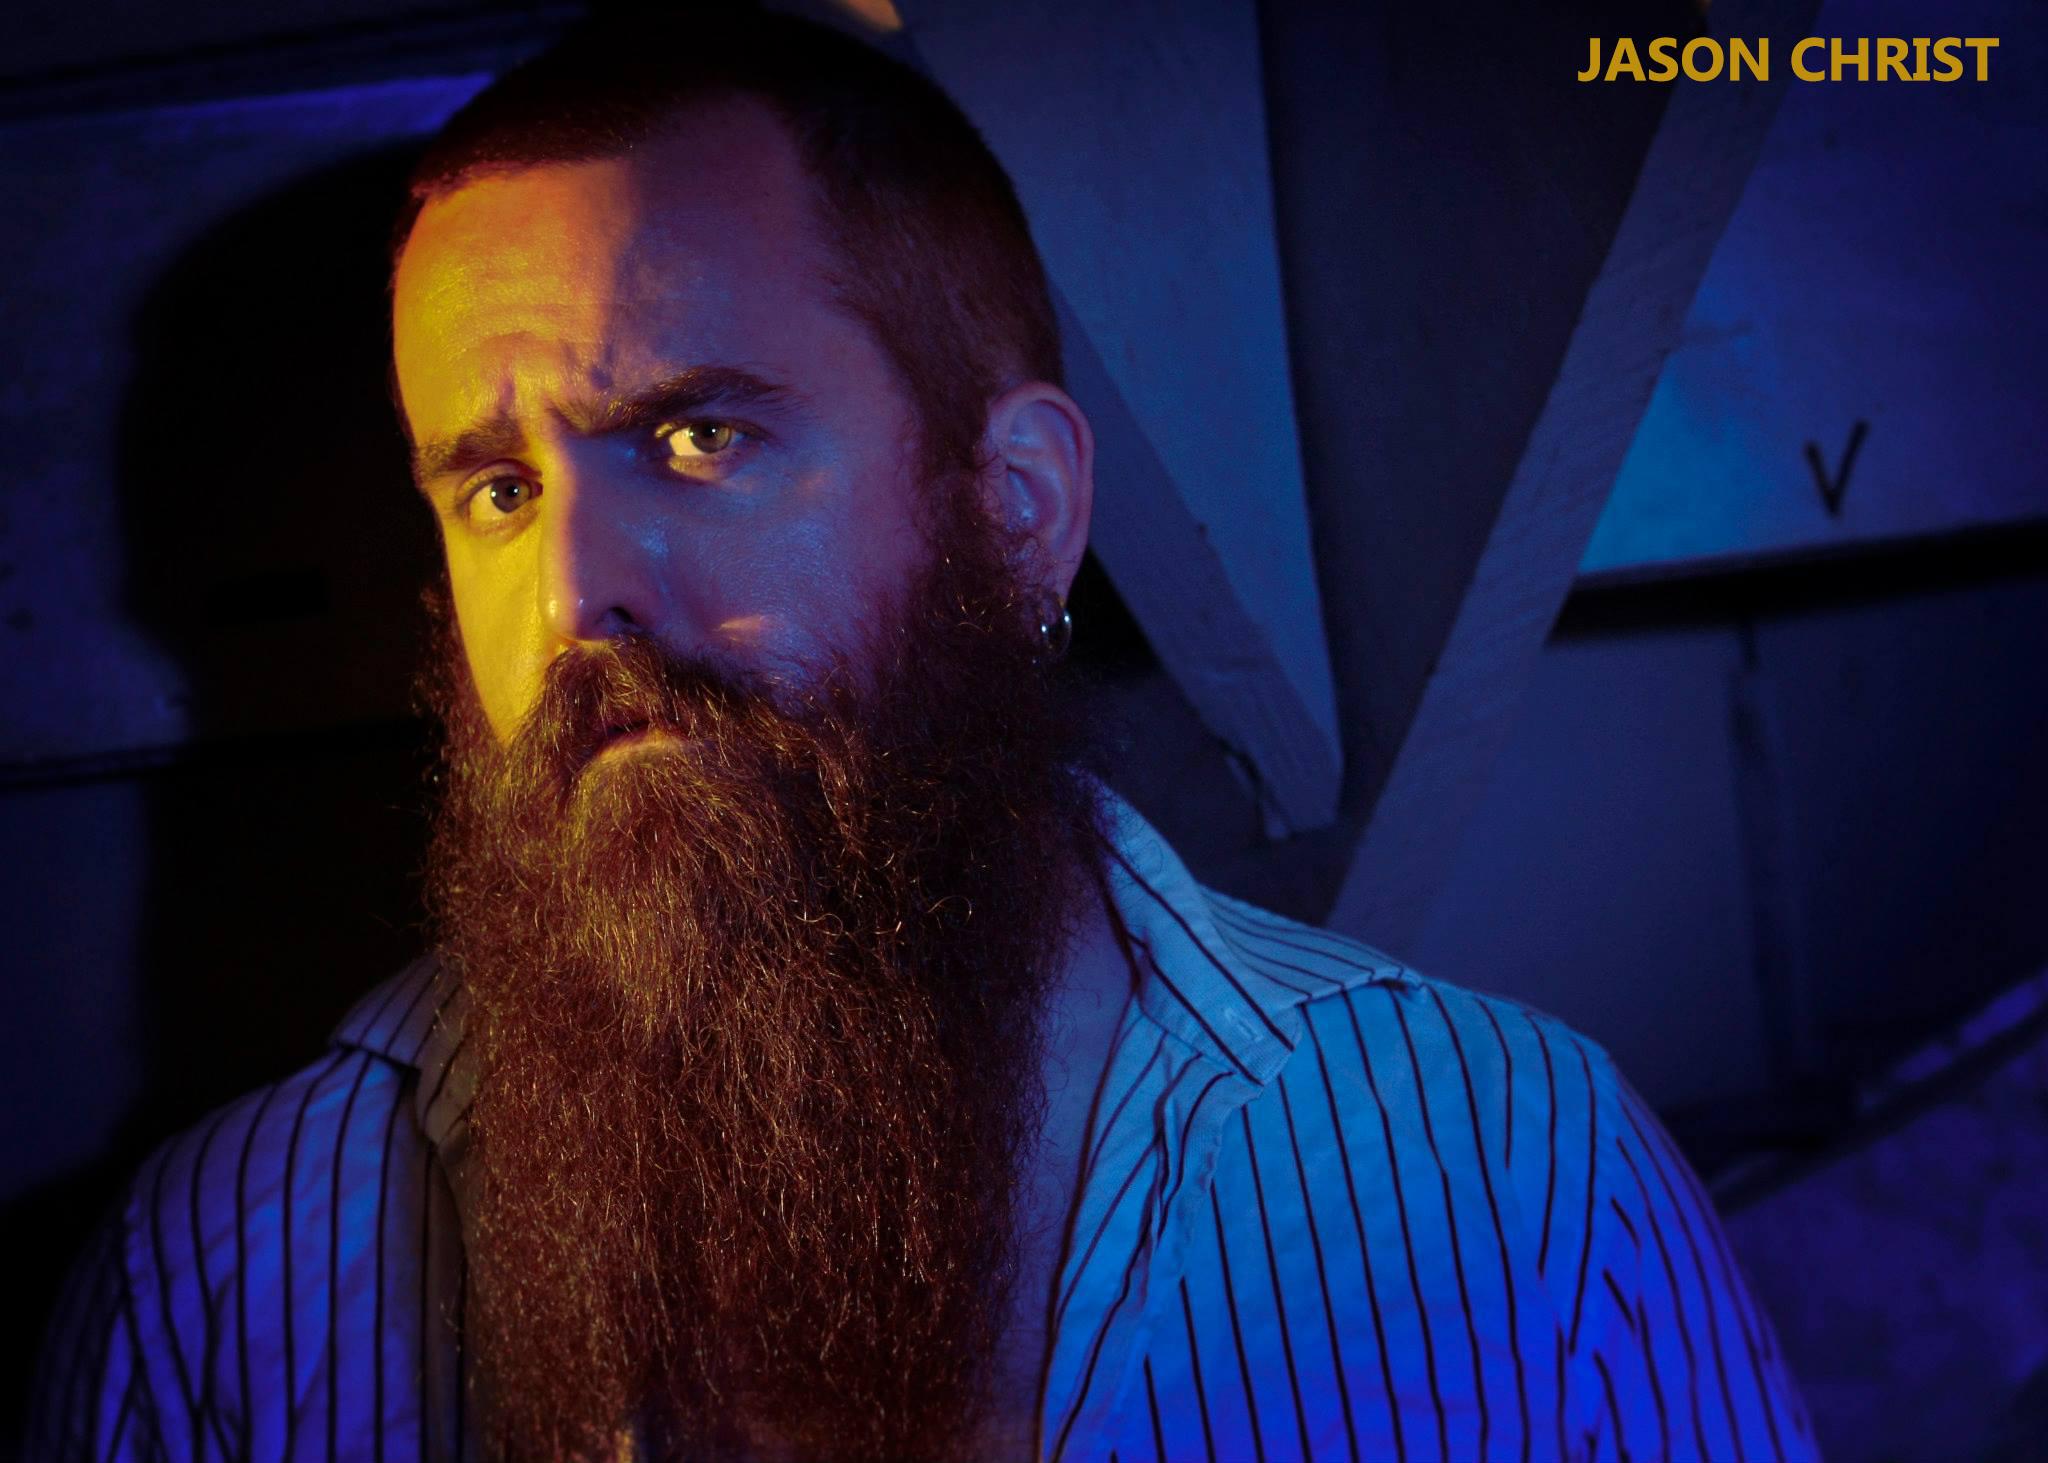 Jason Christ